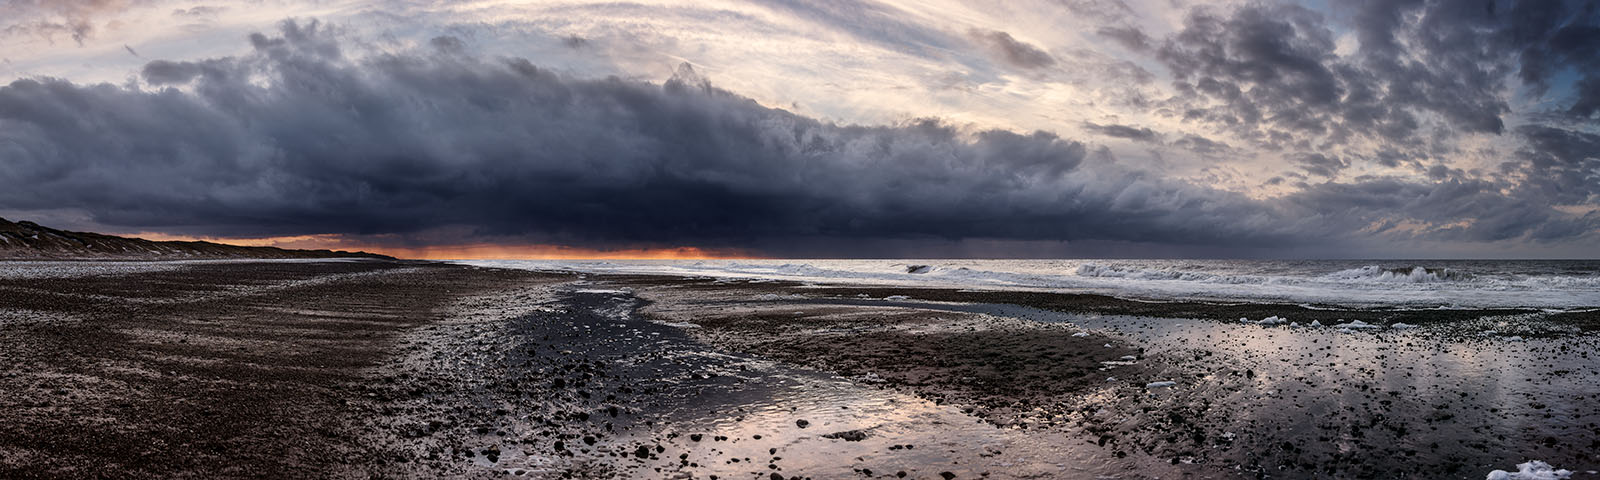 Panorama-NrVorupoer-Januar2015-bearbeitet.jpg